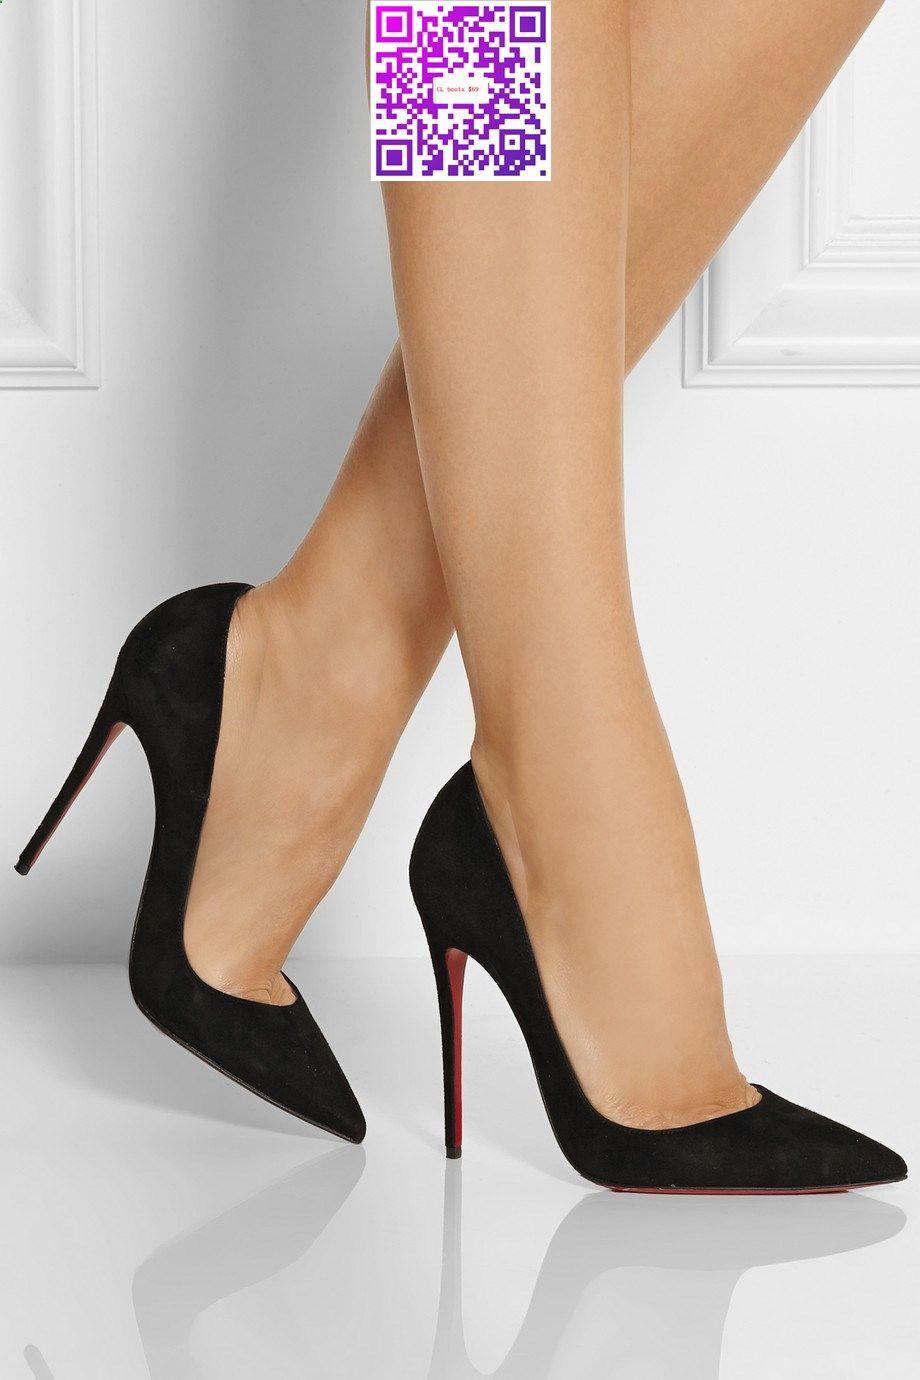 the latest 72e6f 050dc John Barrowman on | 1000+ of shooooooes!! | Shoes, Christian ...